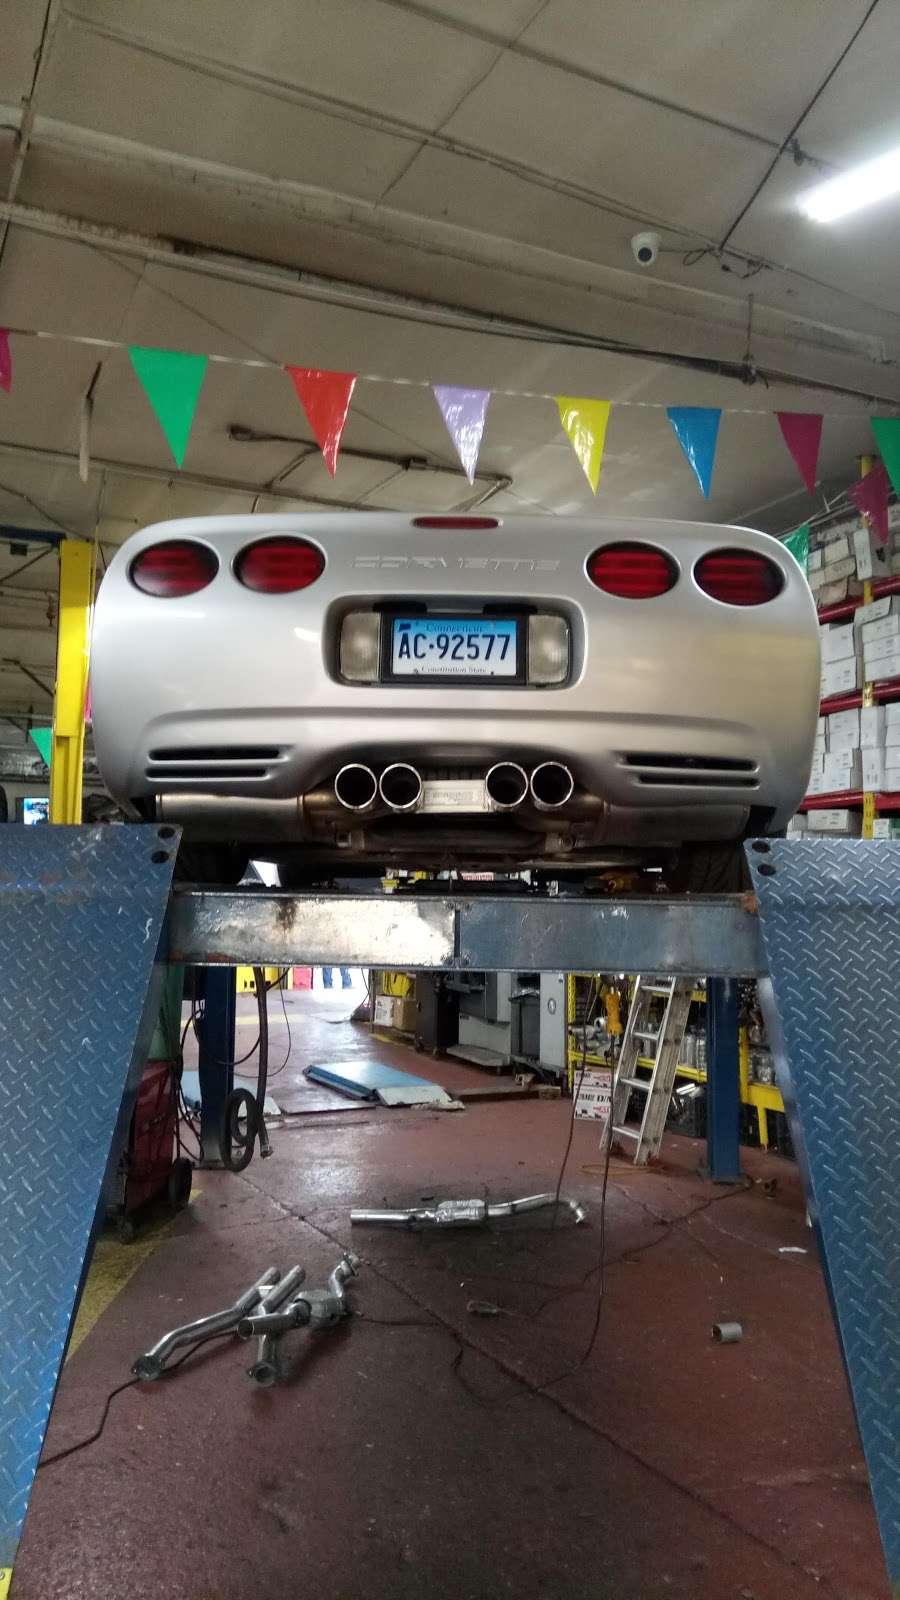 Bronx Discount Muffler Center - car repair  | Photo 6 of 10 | Address: 501 Bruckner Blvd, Bronx, NY 10455, USA | Phone: (718) 402-4422